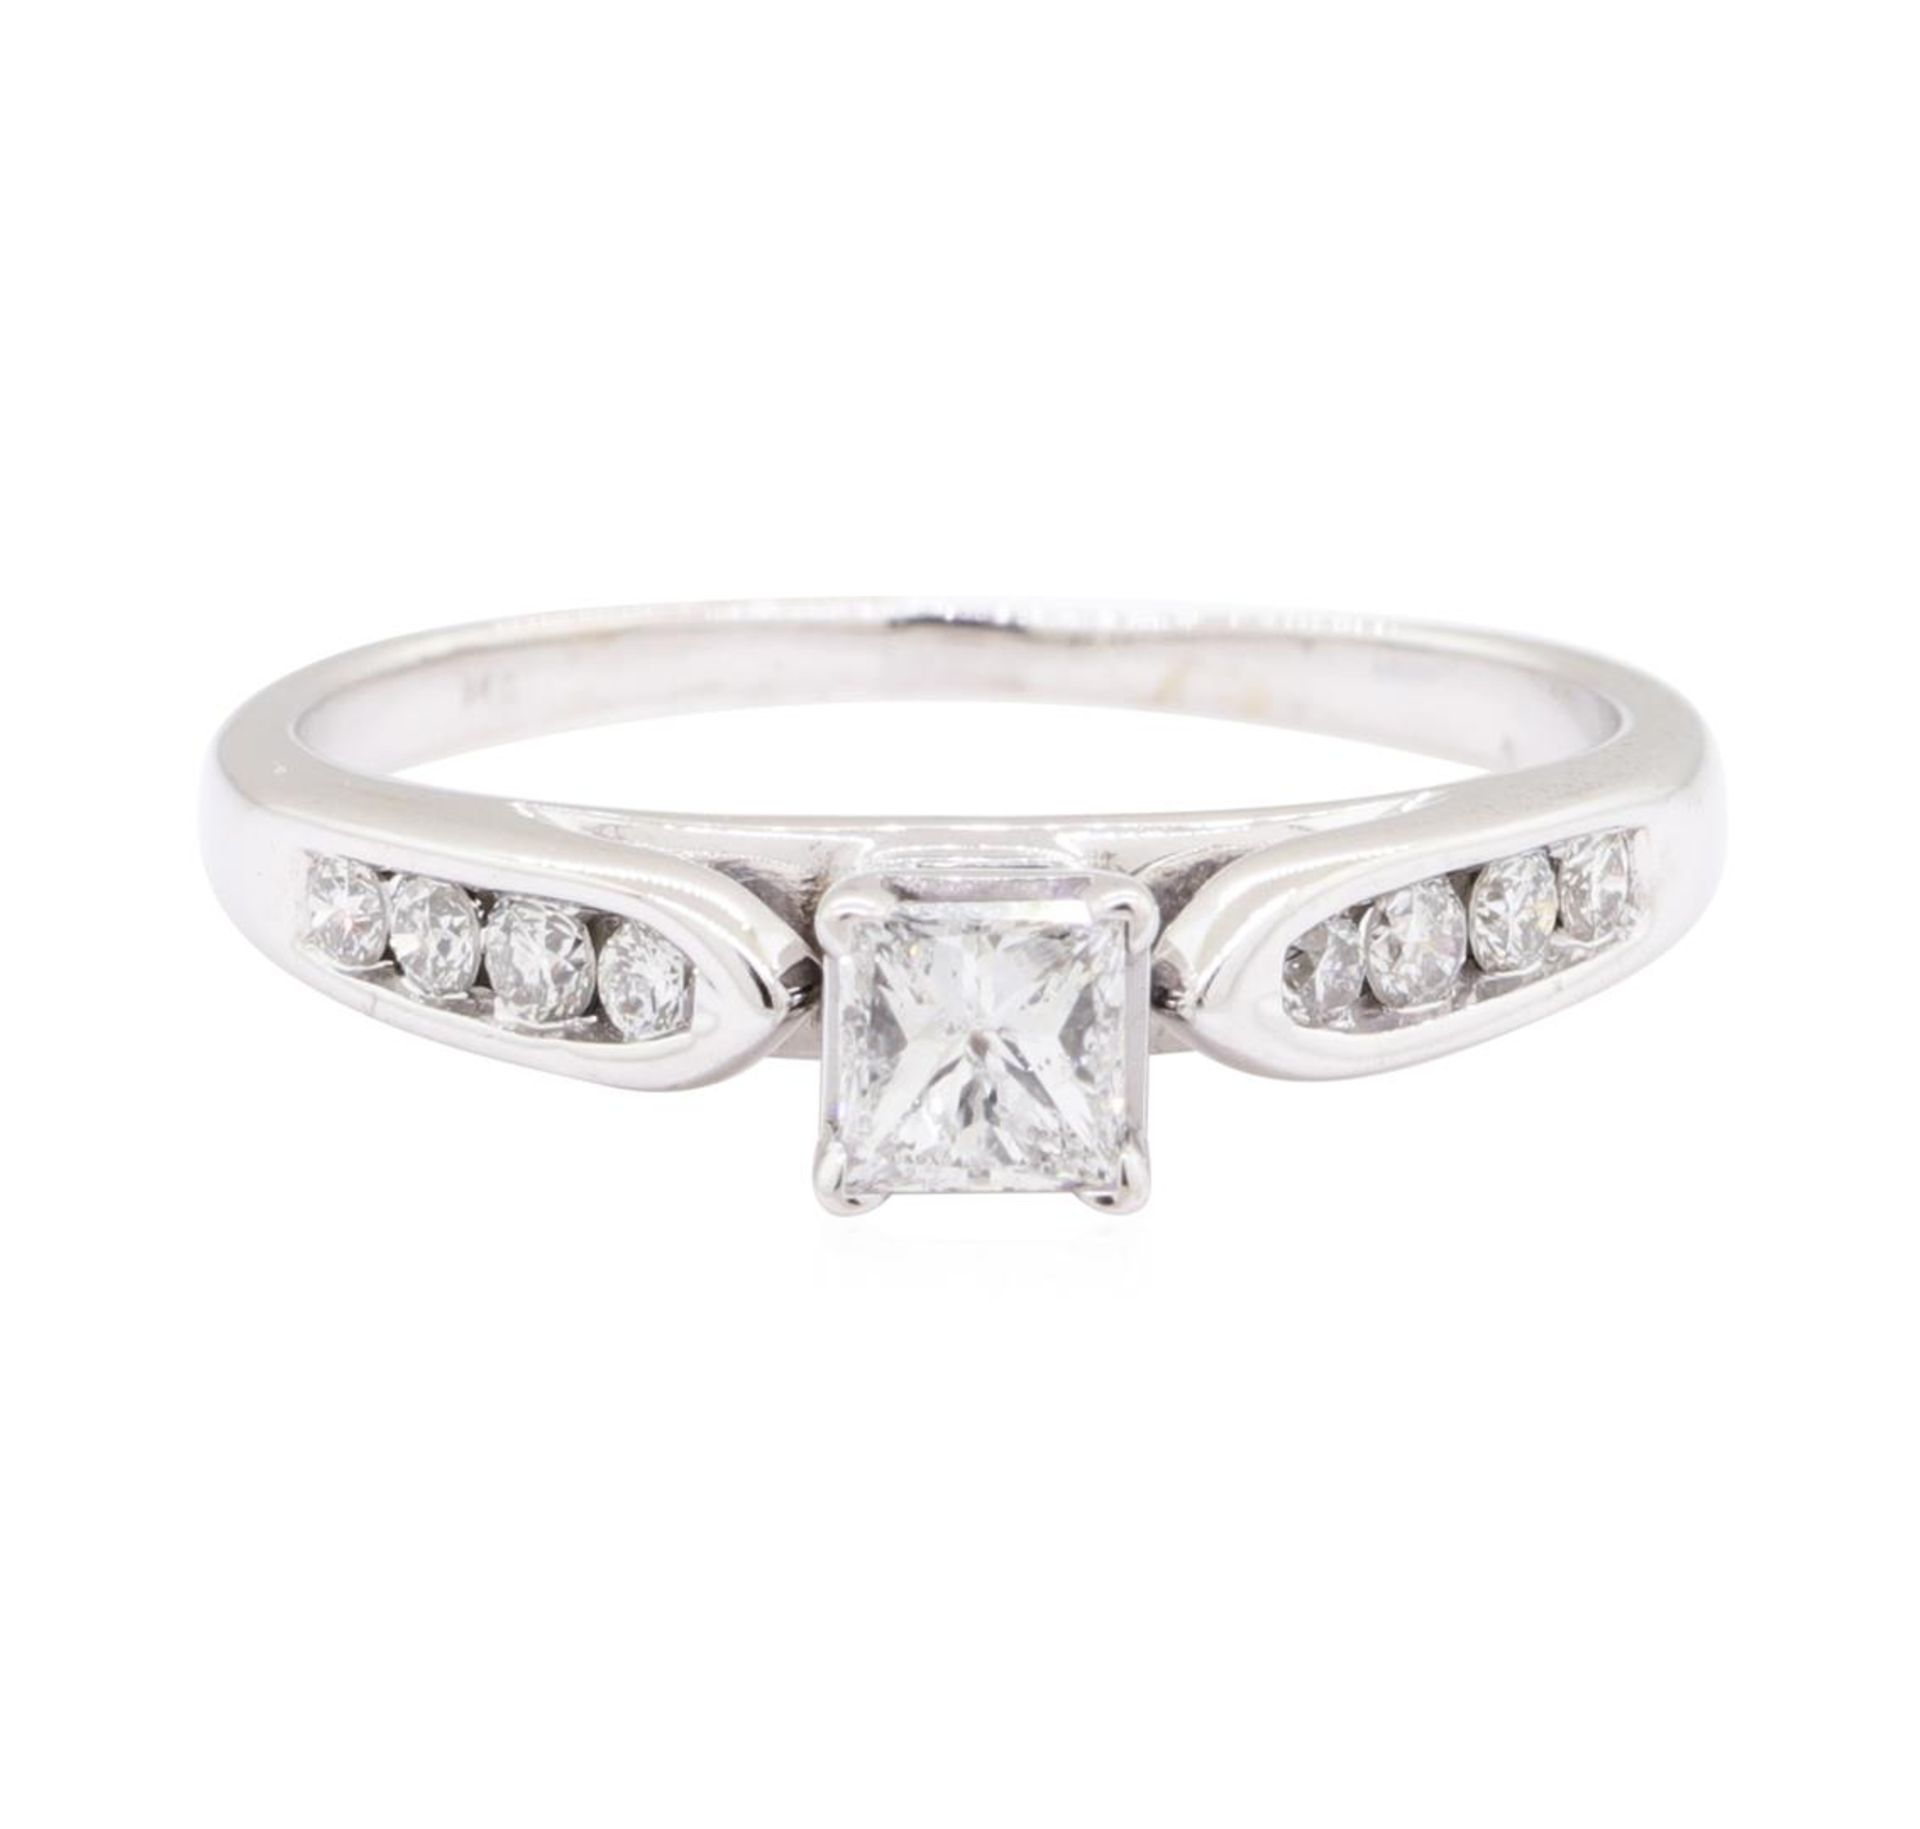 0.70 ctw Diamond Ring - 14KT White Gold - Image 2 of 4